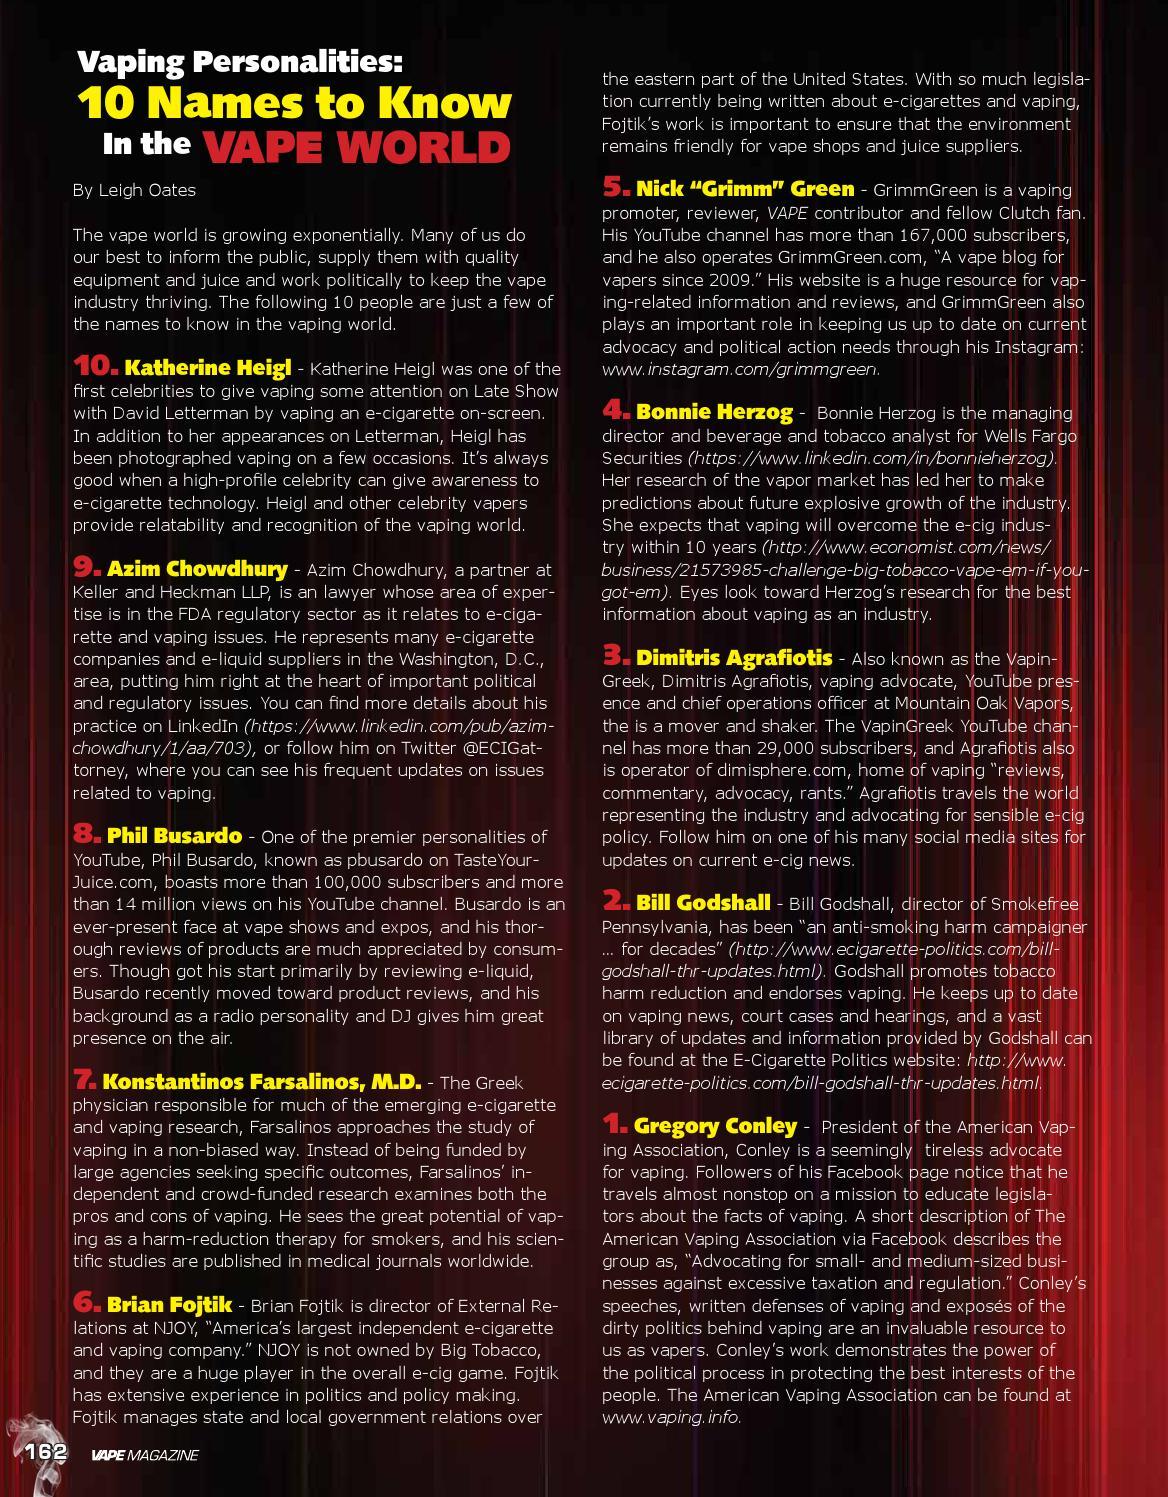 VAPE Magazine October 2015 by Matt Schramel - issuu